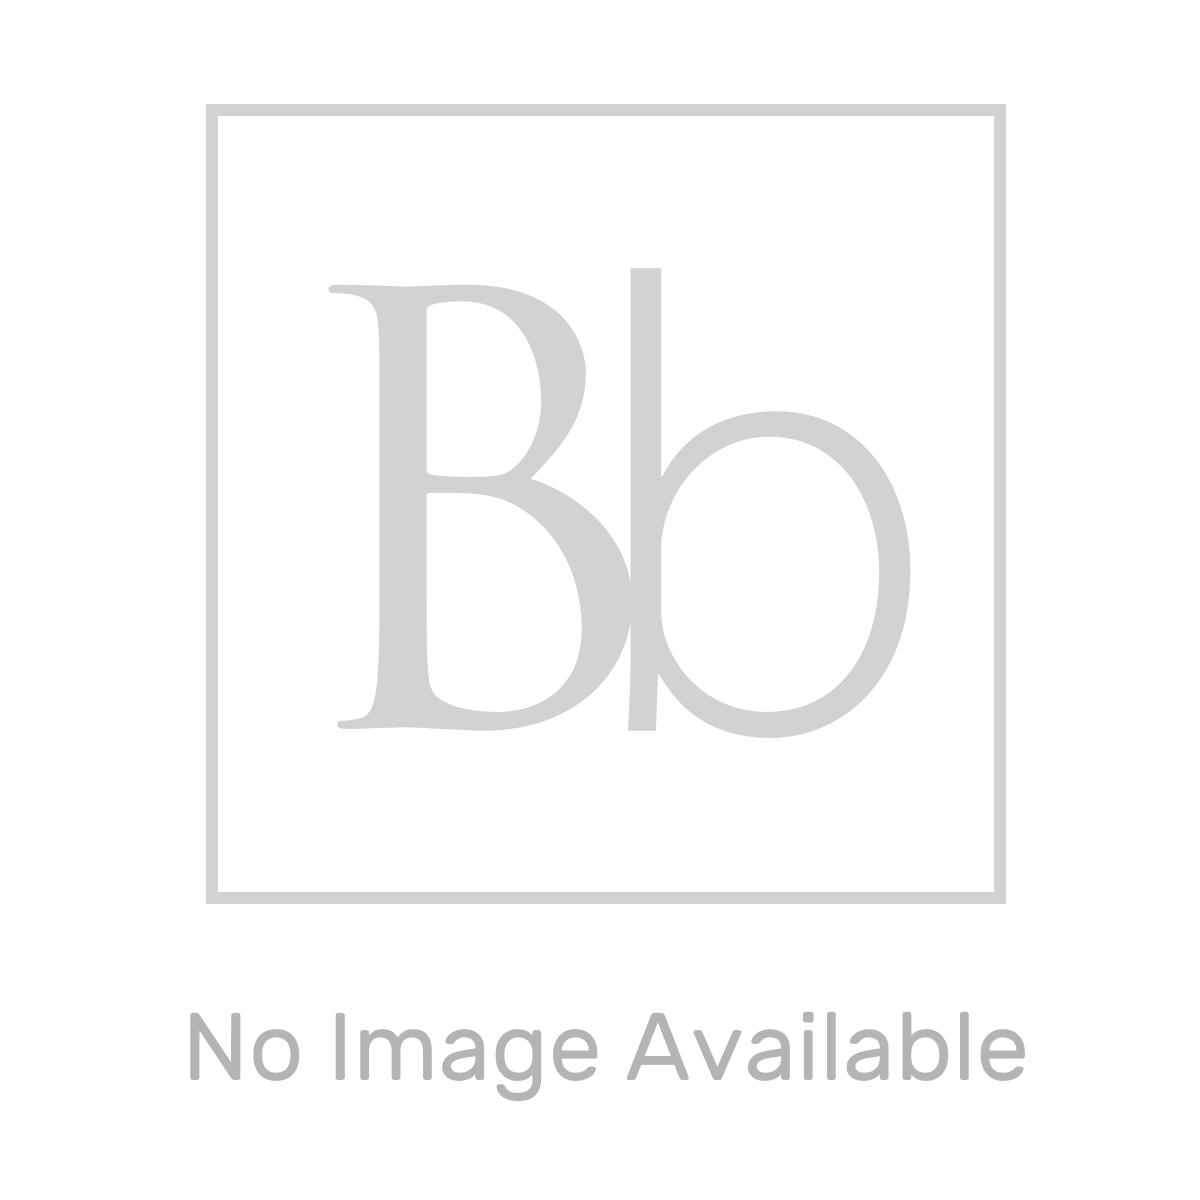 Premier Athena Natural Oak 2 Drawer Wall Hung Vanity Unit 600mm